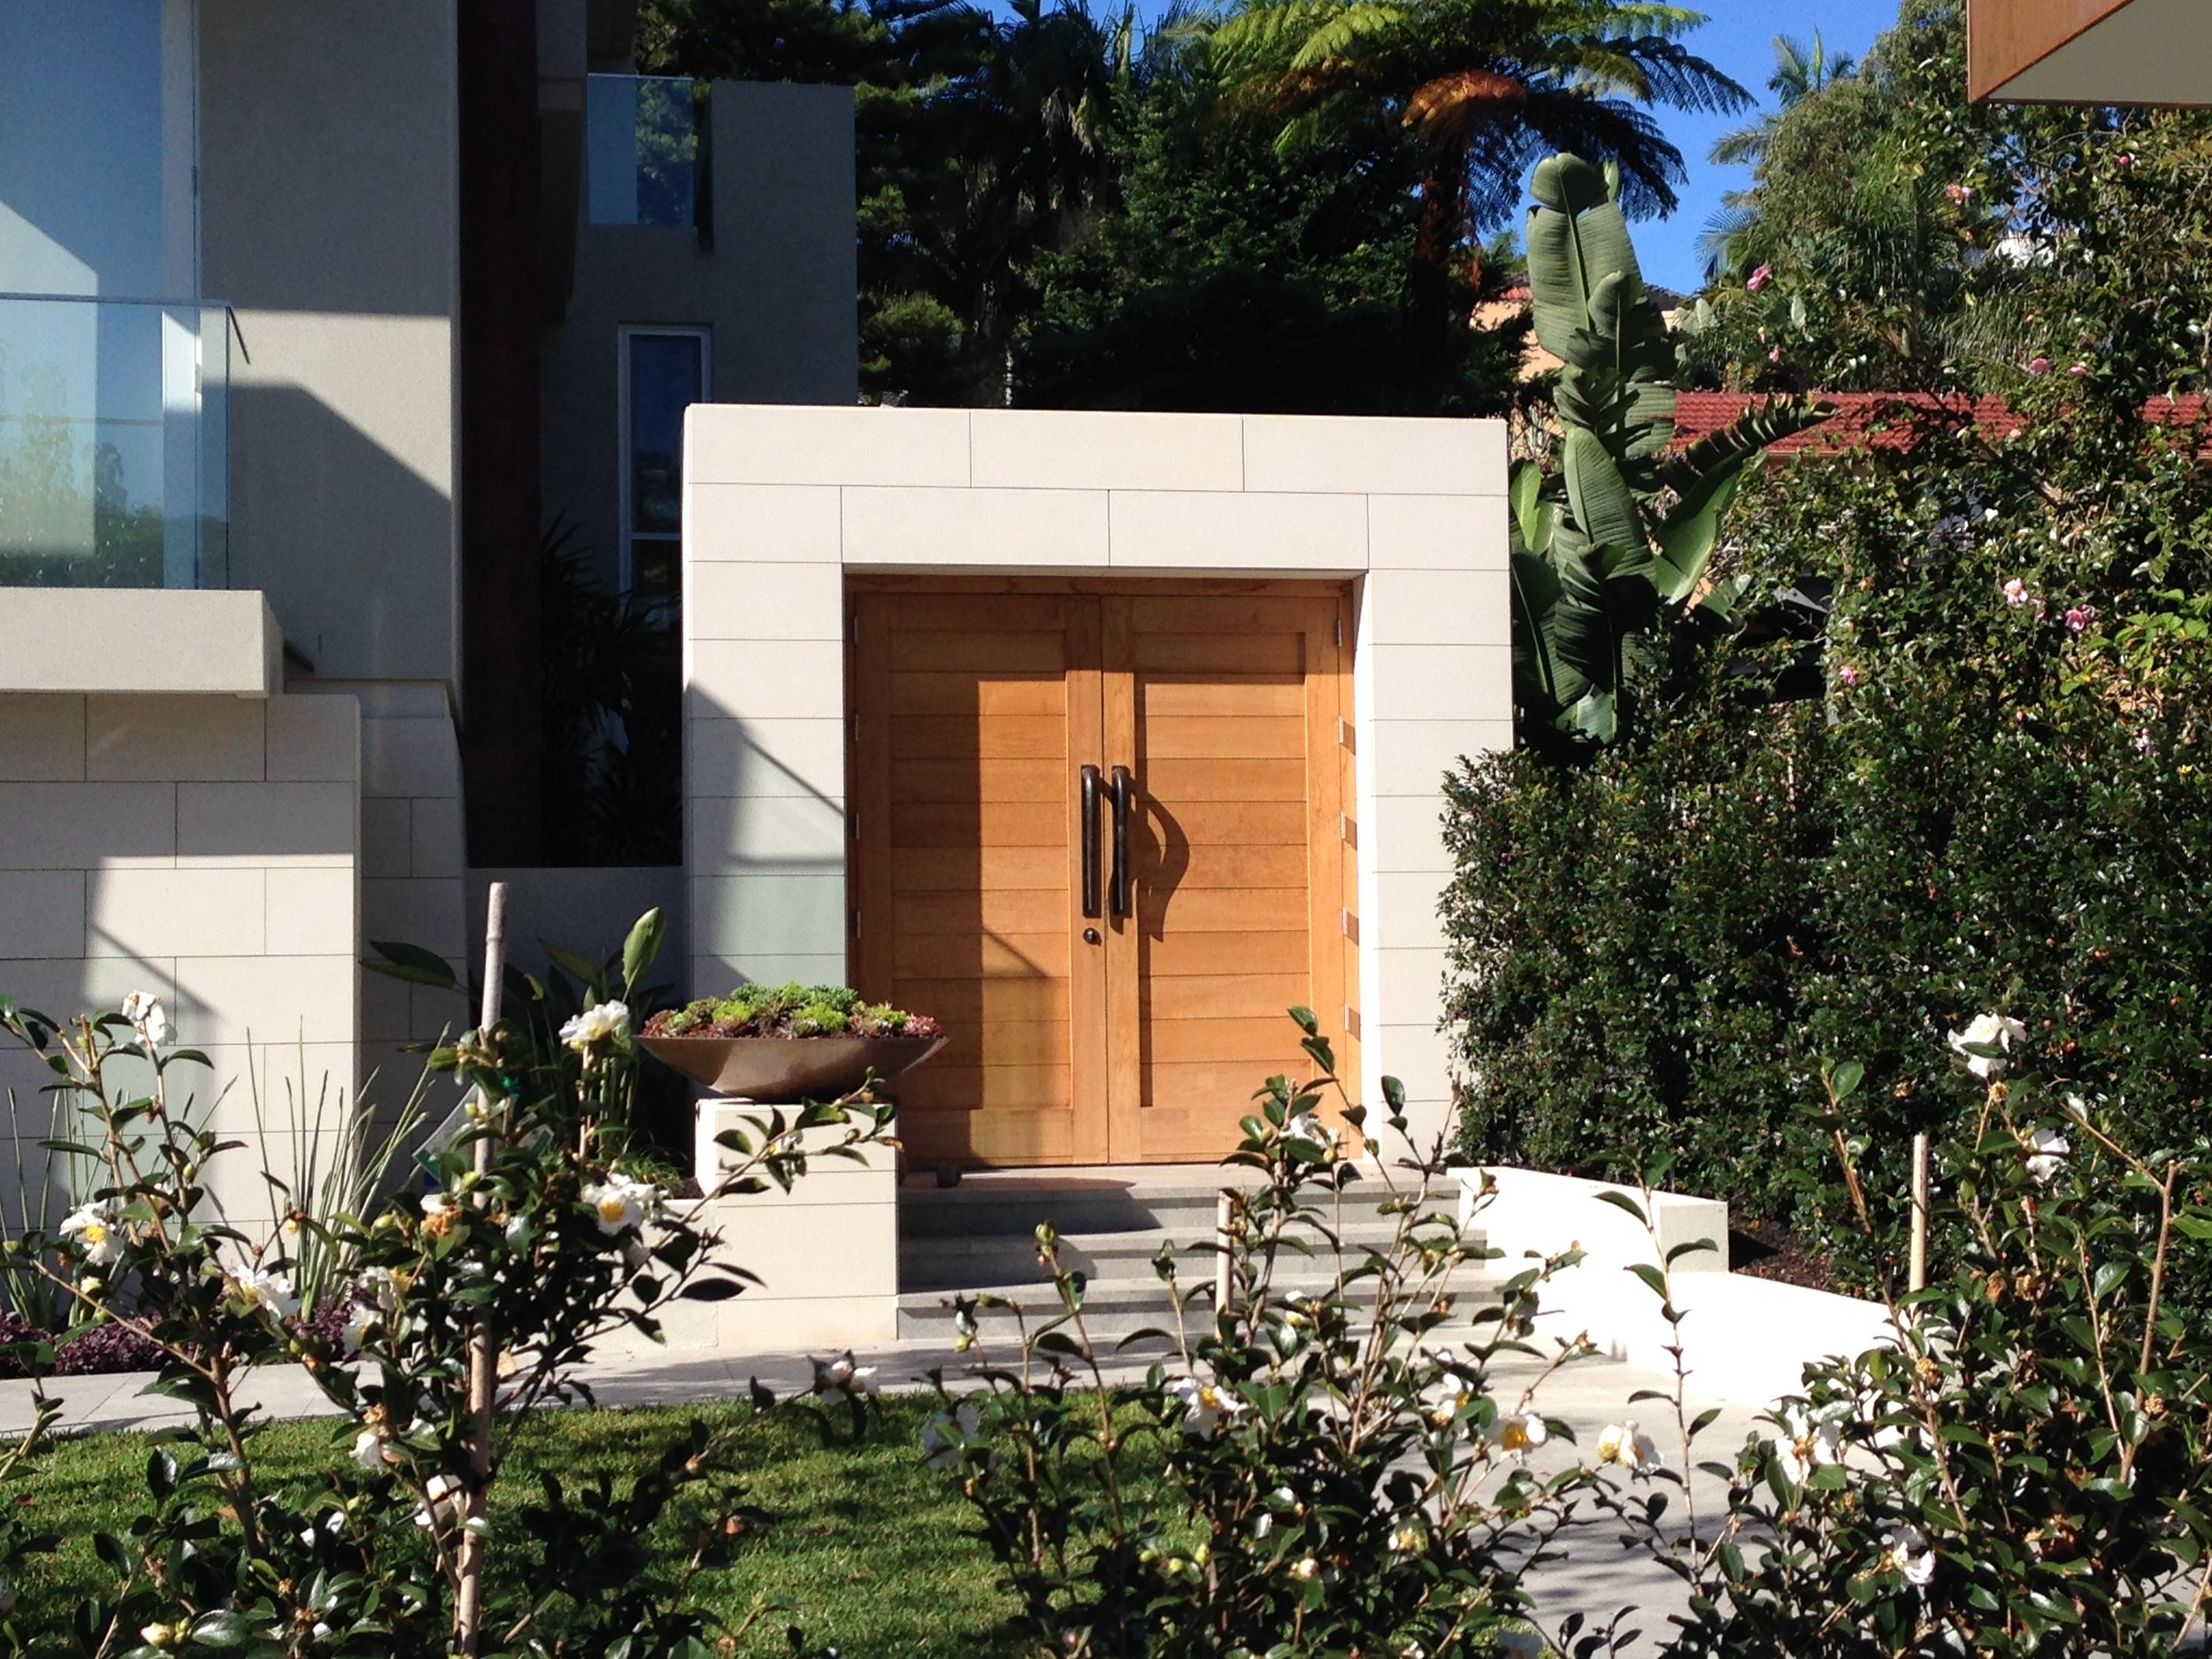 Elite stonemason - vaucluse project- pure white sawn cladding entrance  (5).JPG